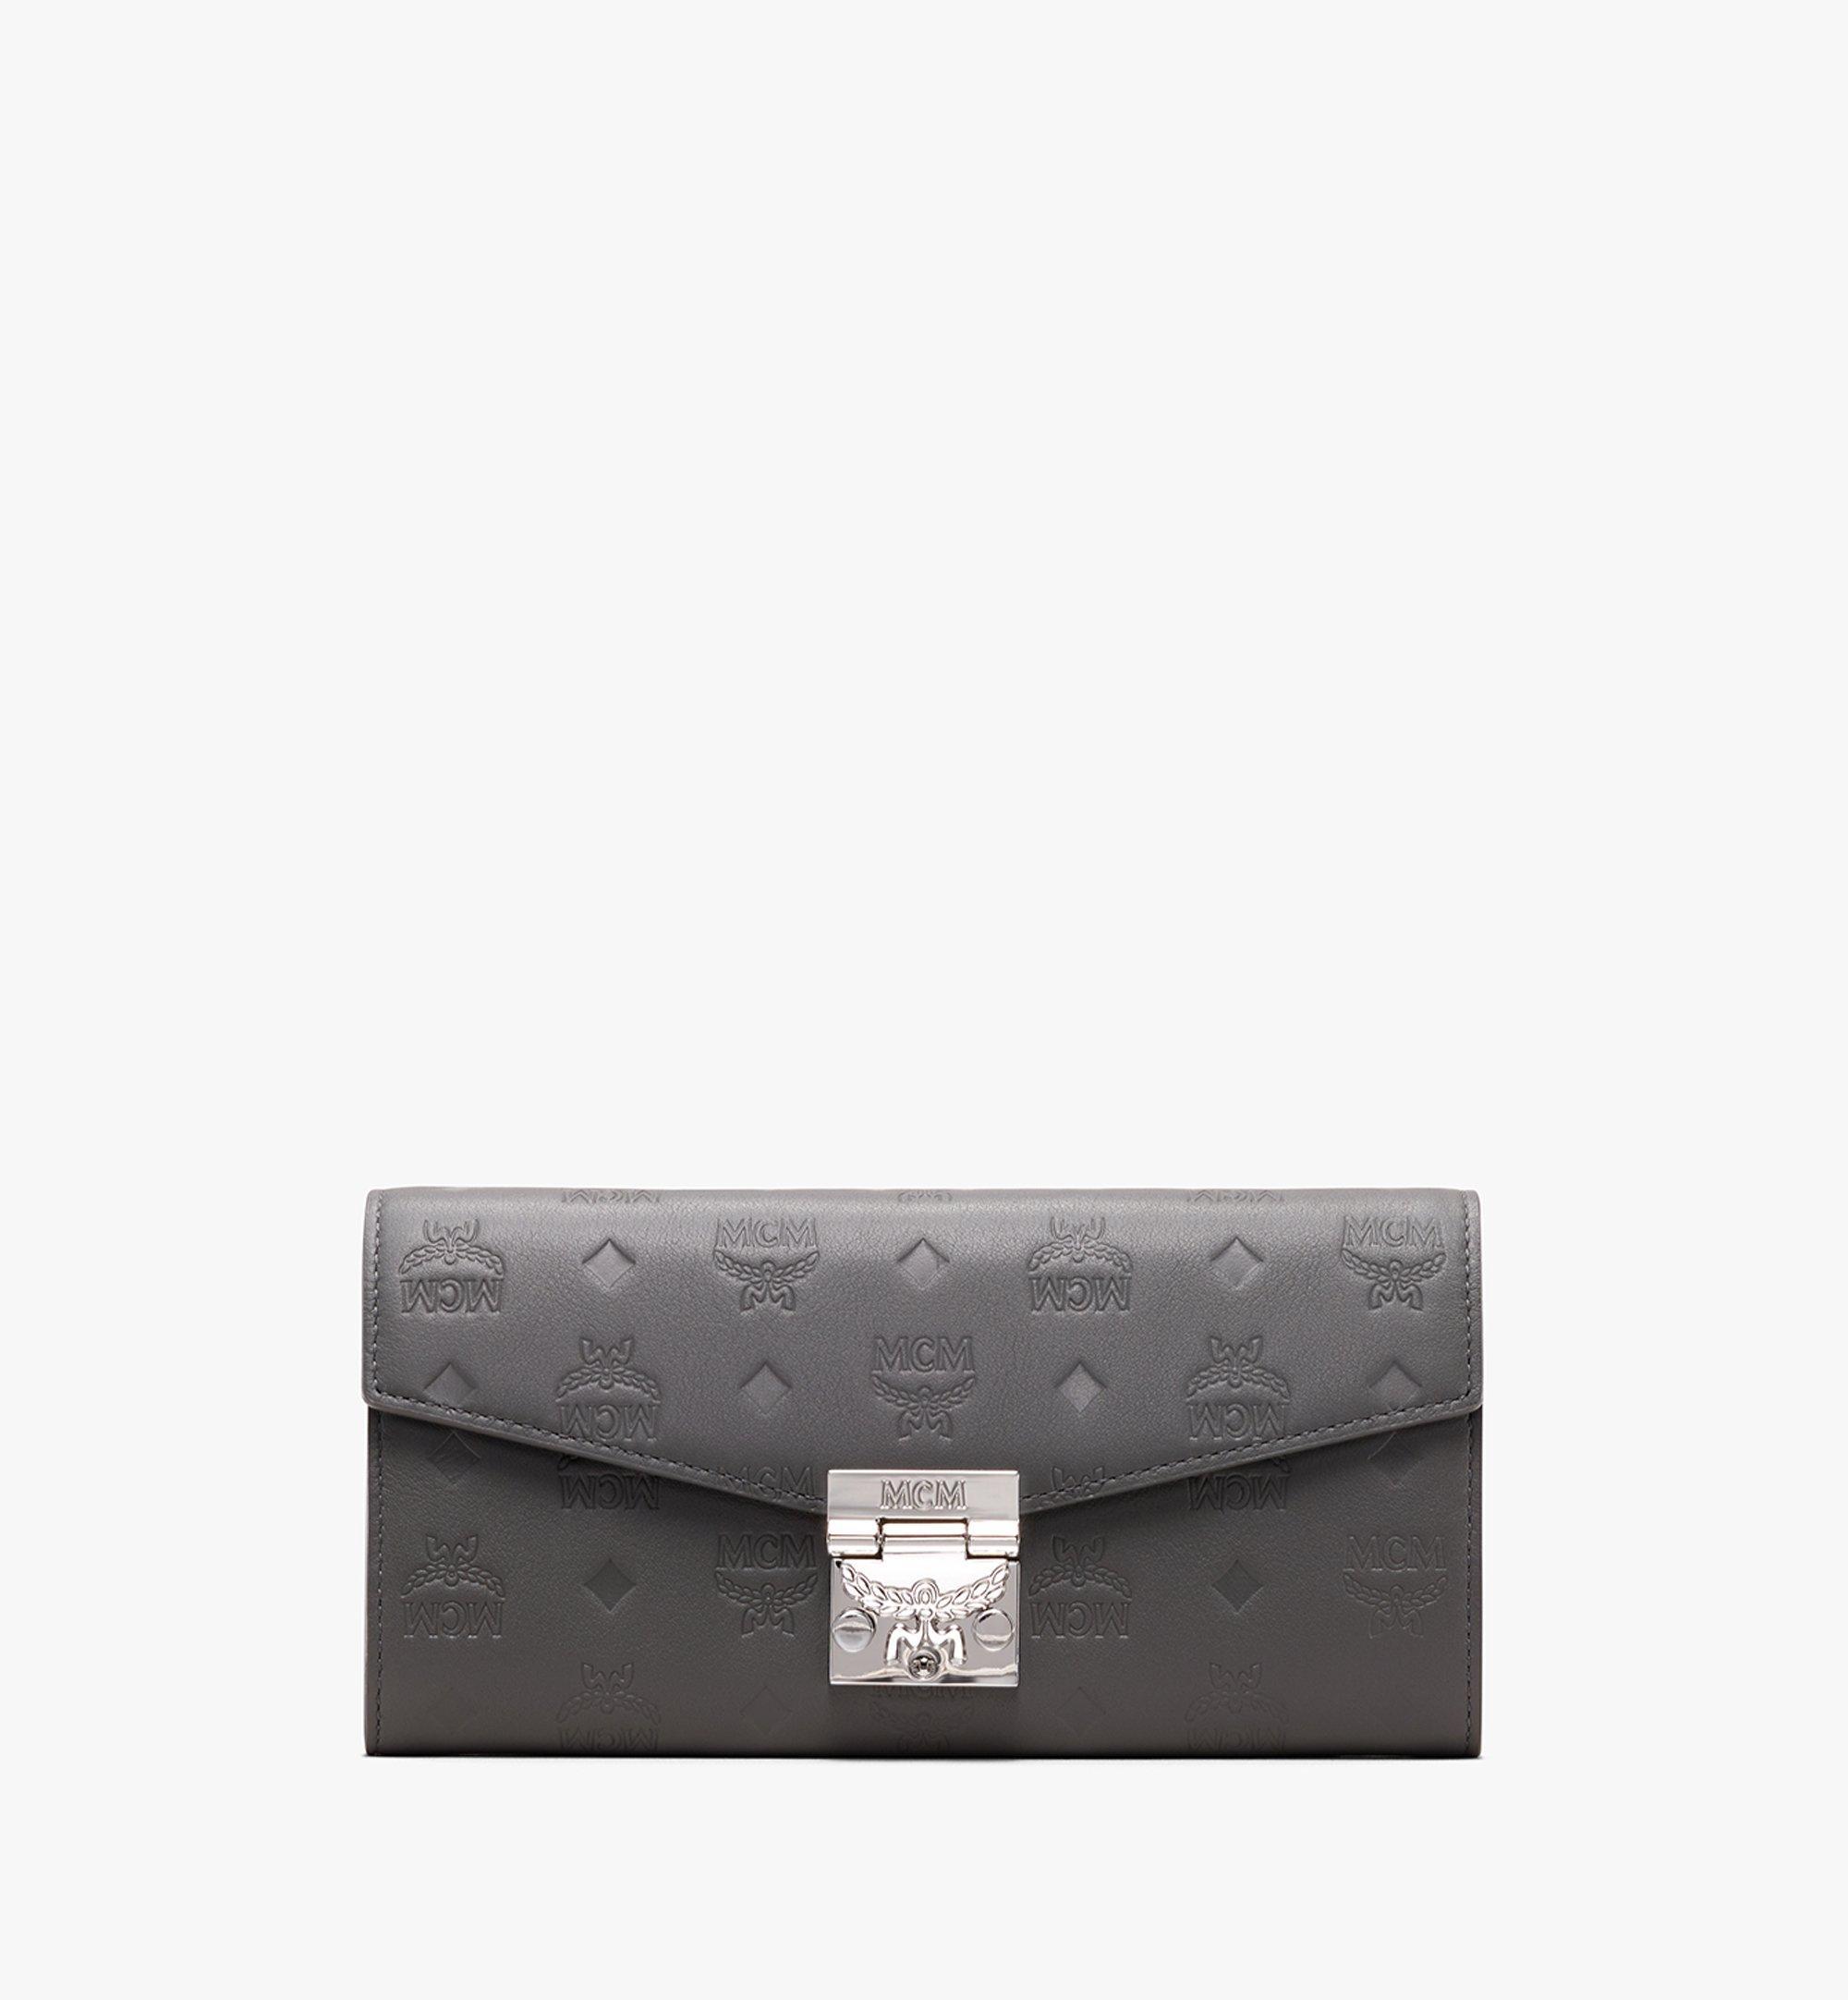 MCM Patricia Crossbody Wallet in Monogram Leather Grey MYL9APA55EC001 Alternate View 1